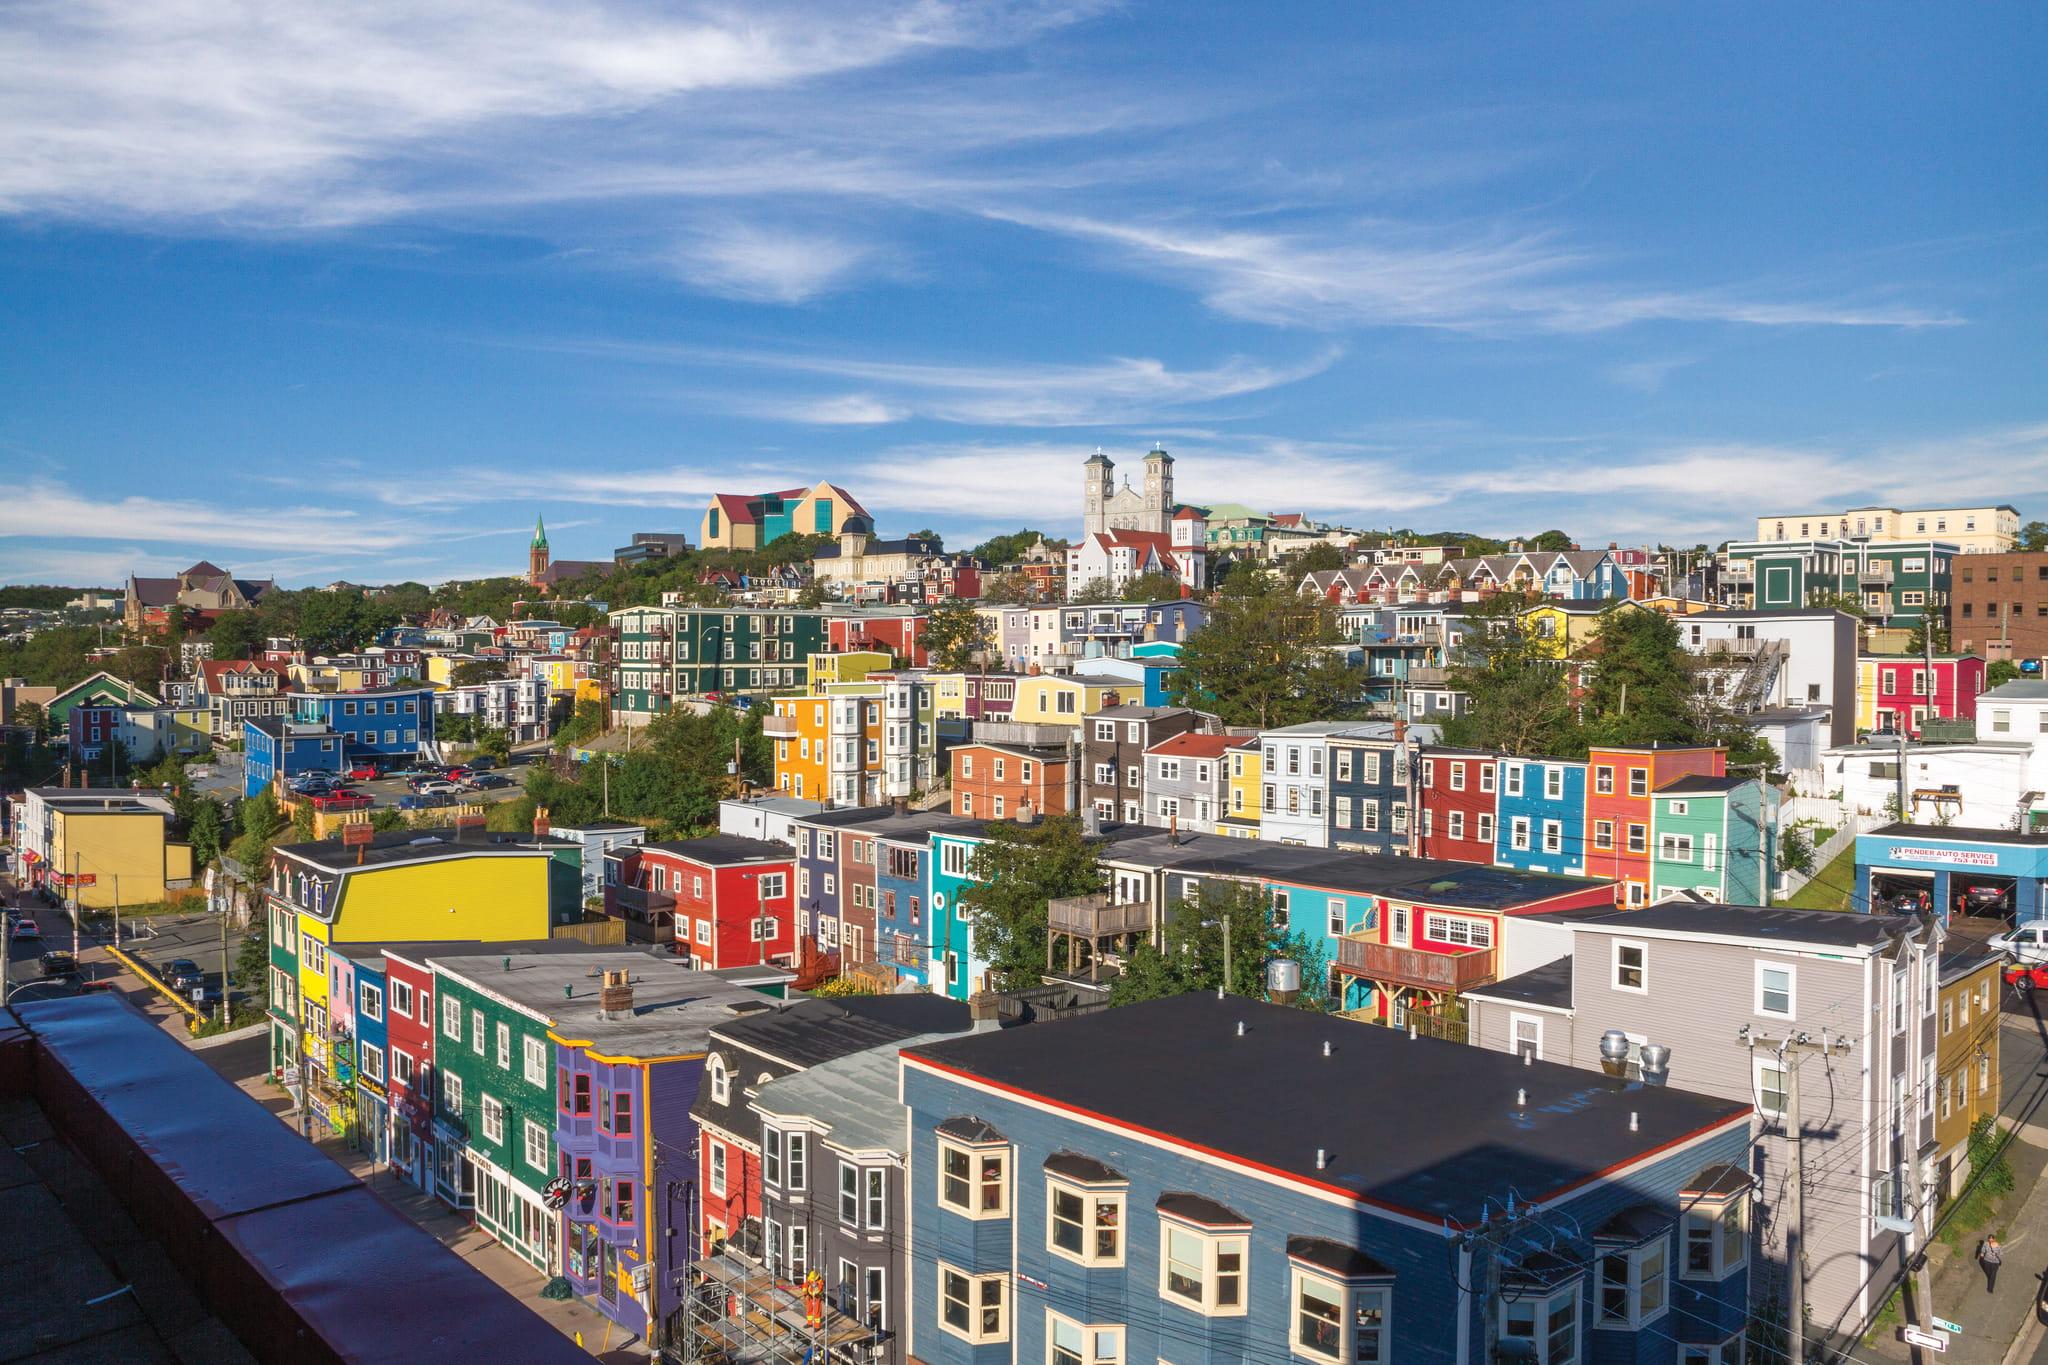 St. John's and its colourful houses. Jellybean Row